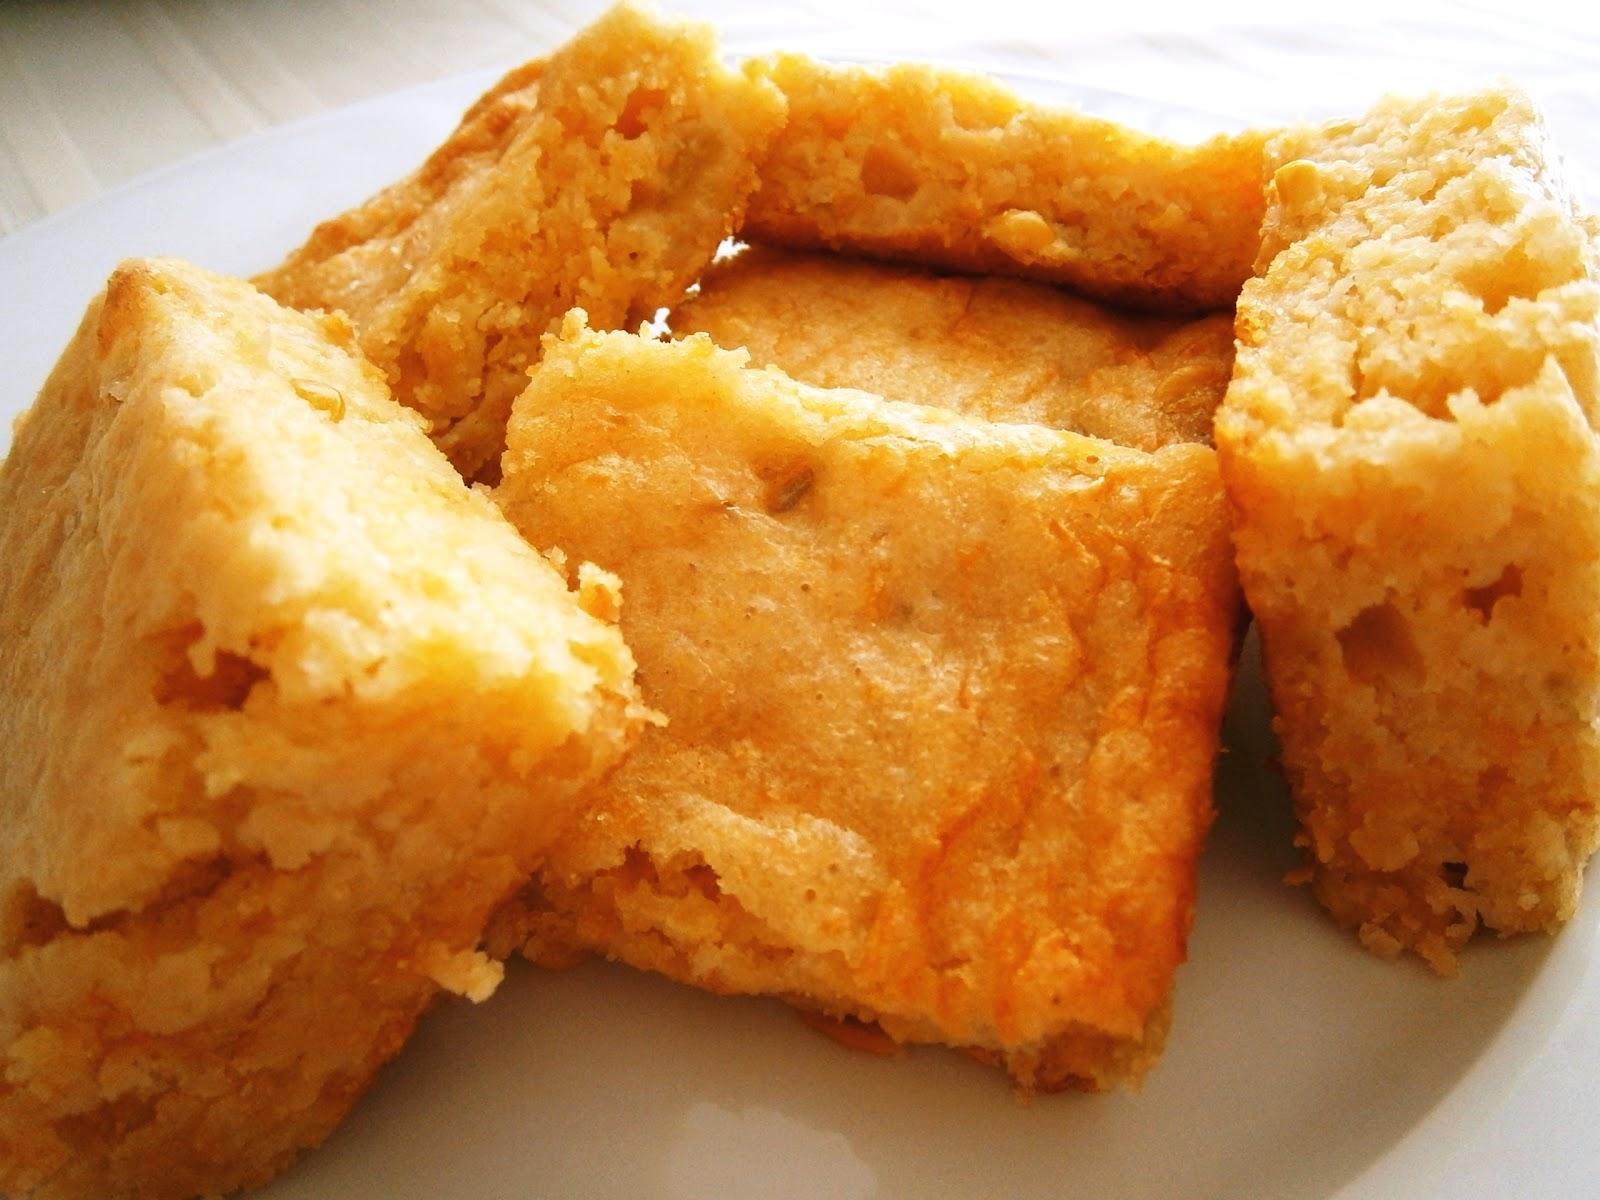 SucreSuKo: Ultimate Jalapeno Cheddar Cornbread